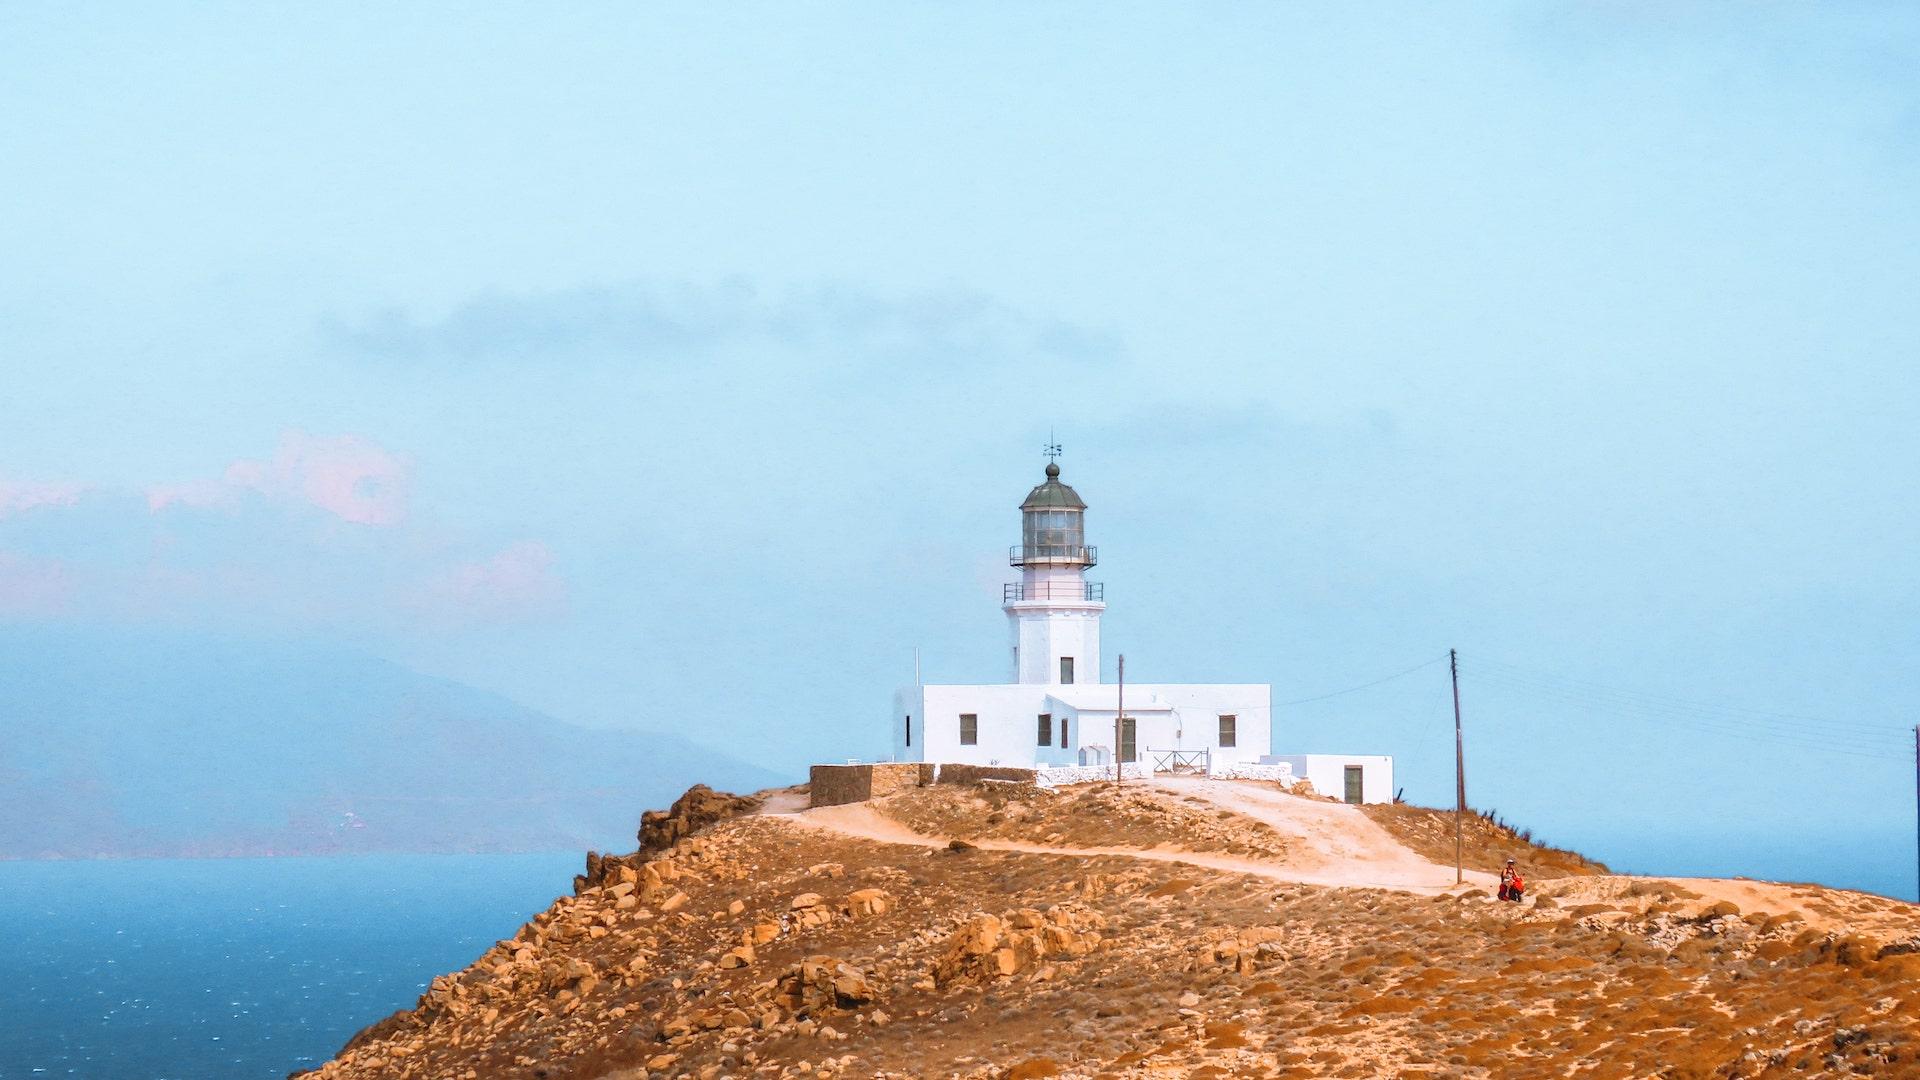 Grécia - Dicas valiosas sobre as Ilhas Gregas